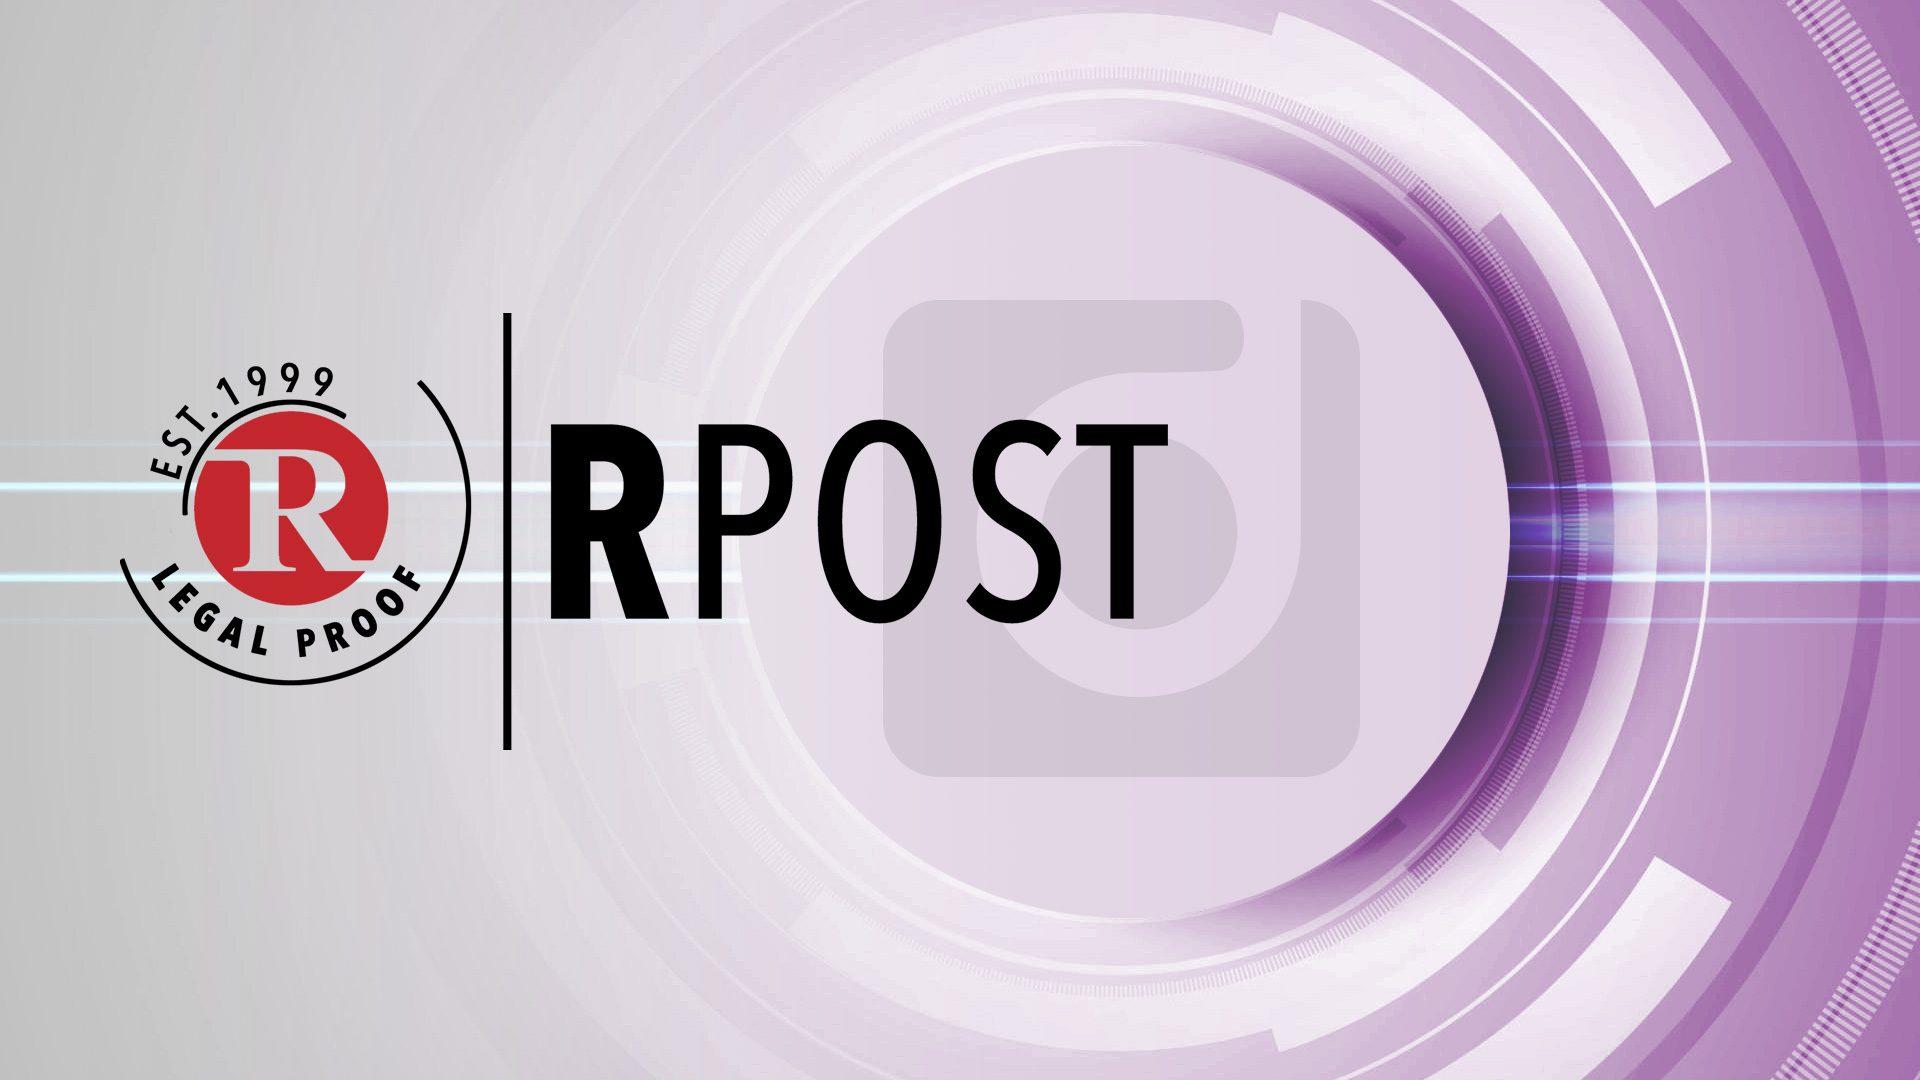 rpost